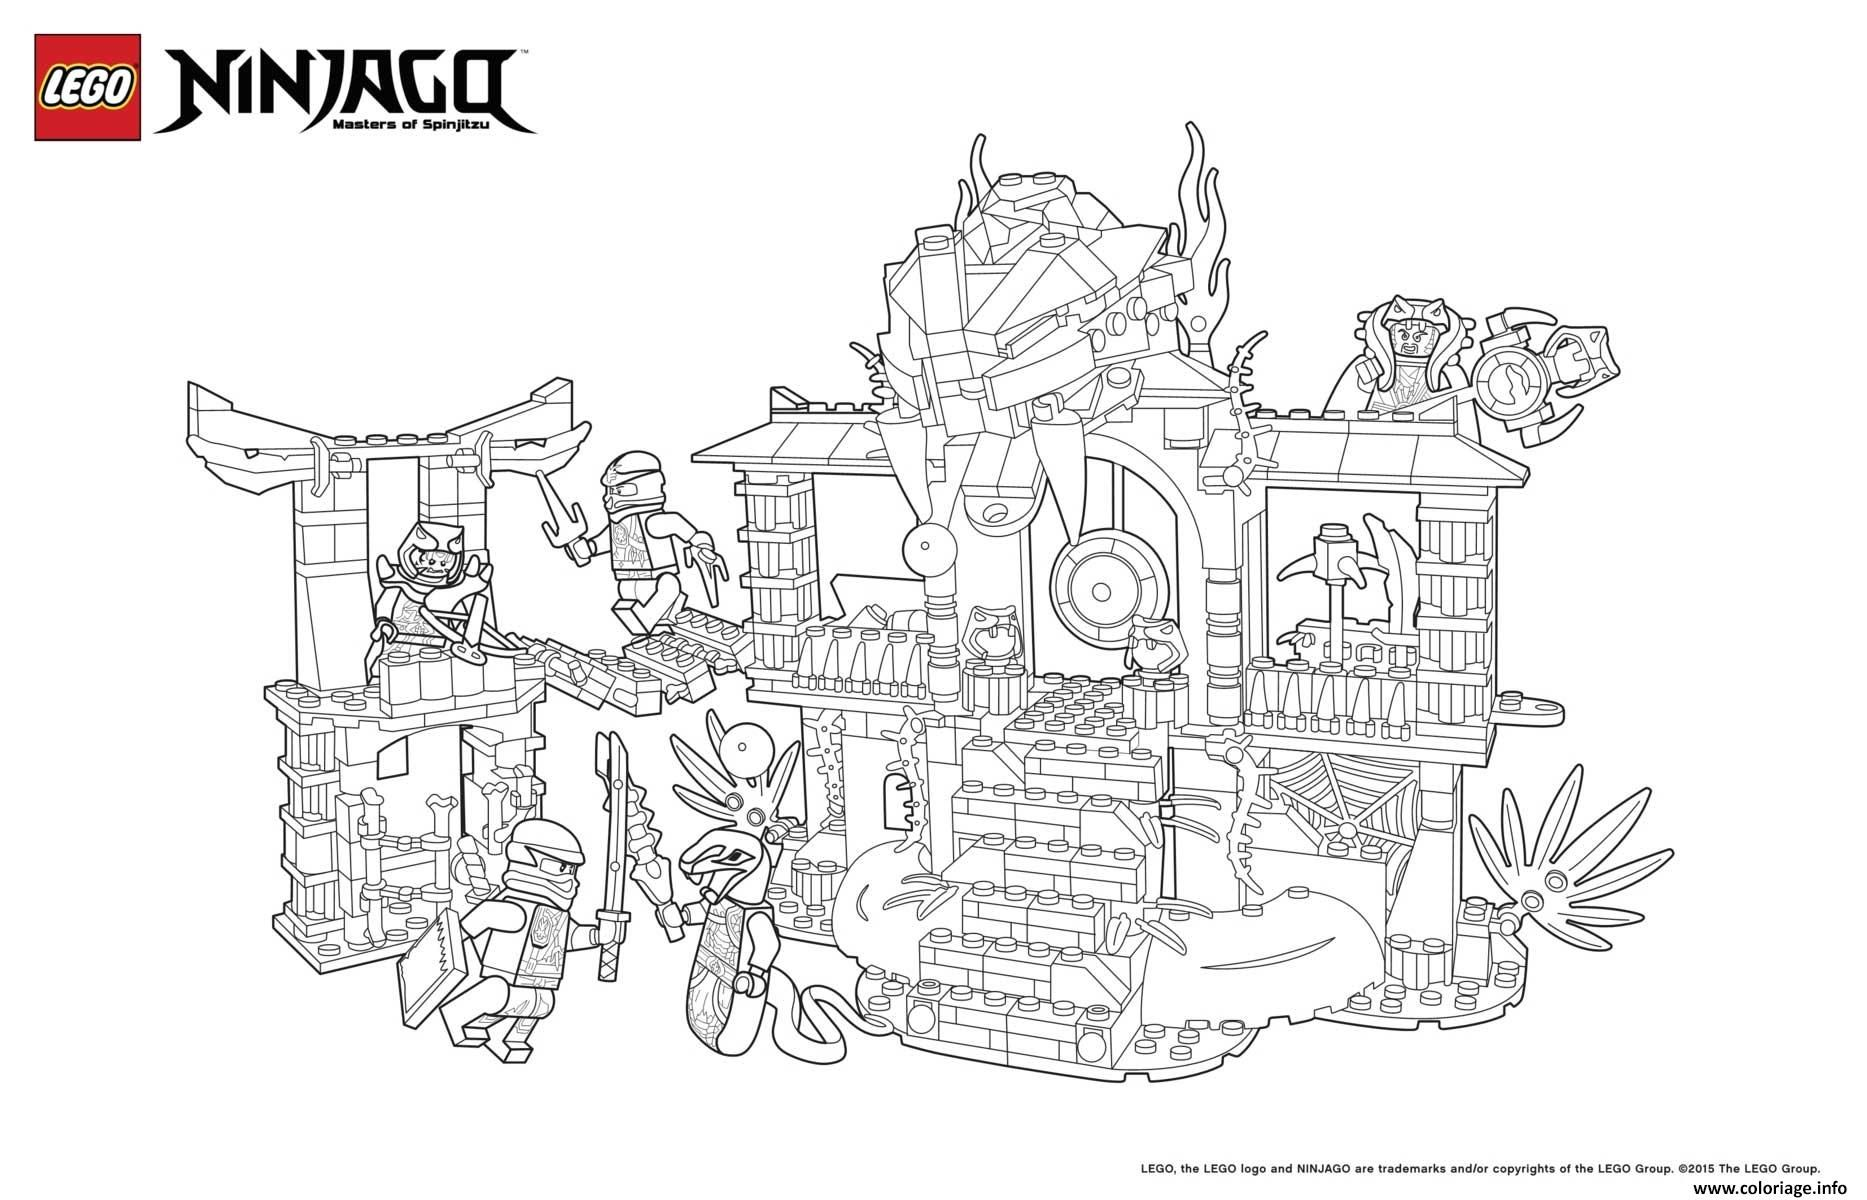 Coloriage le palais de ninjago lego Dessin à imprimer  Coloriage